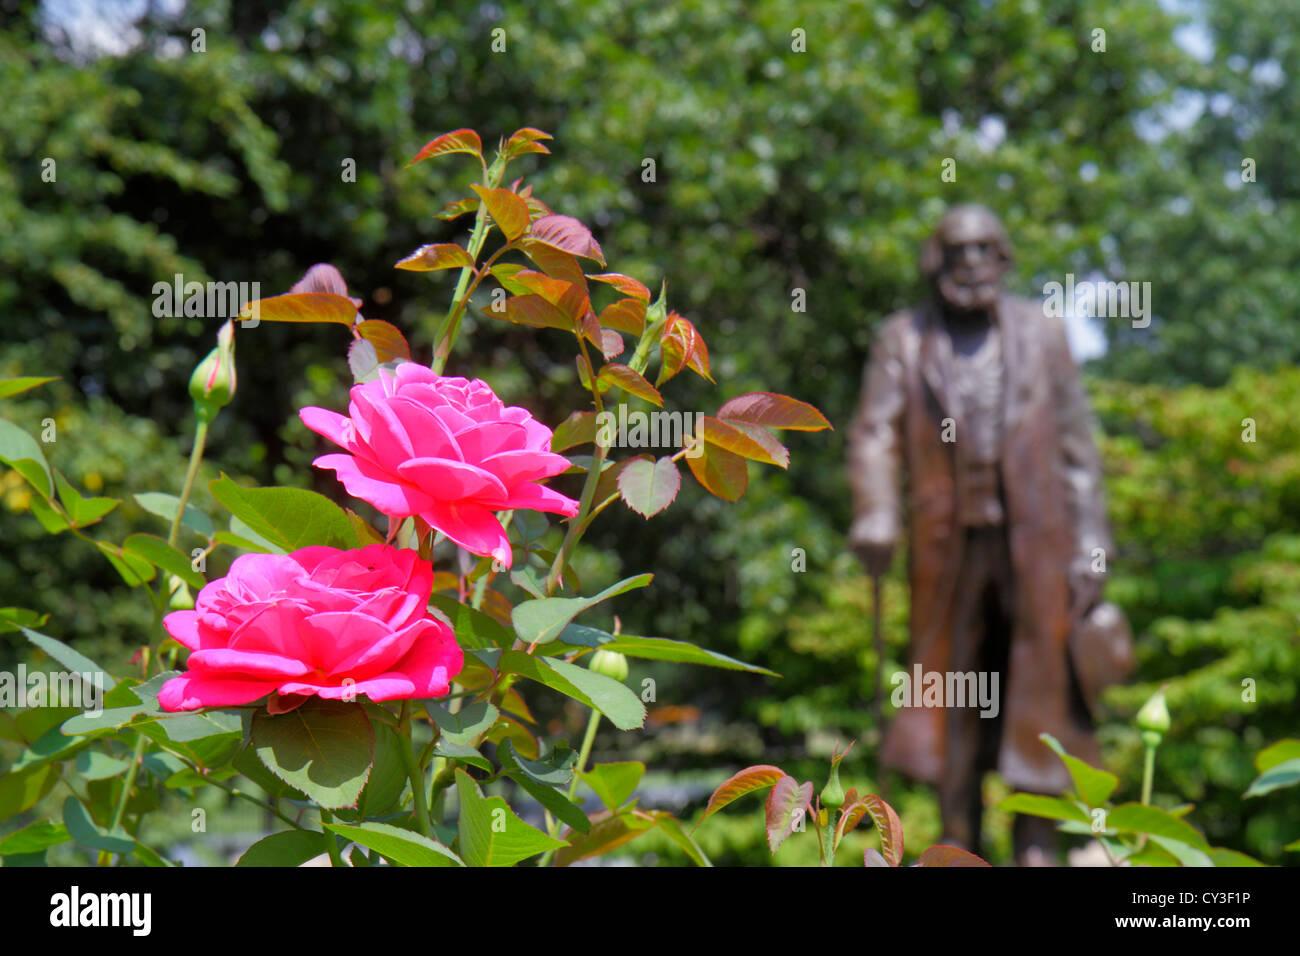 Boston Massachusetts Boston Public Garden rose flower Edward Everett Hale statue author historian Unitarian clergyman - Stock Image